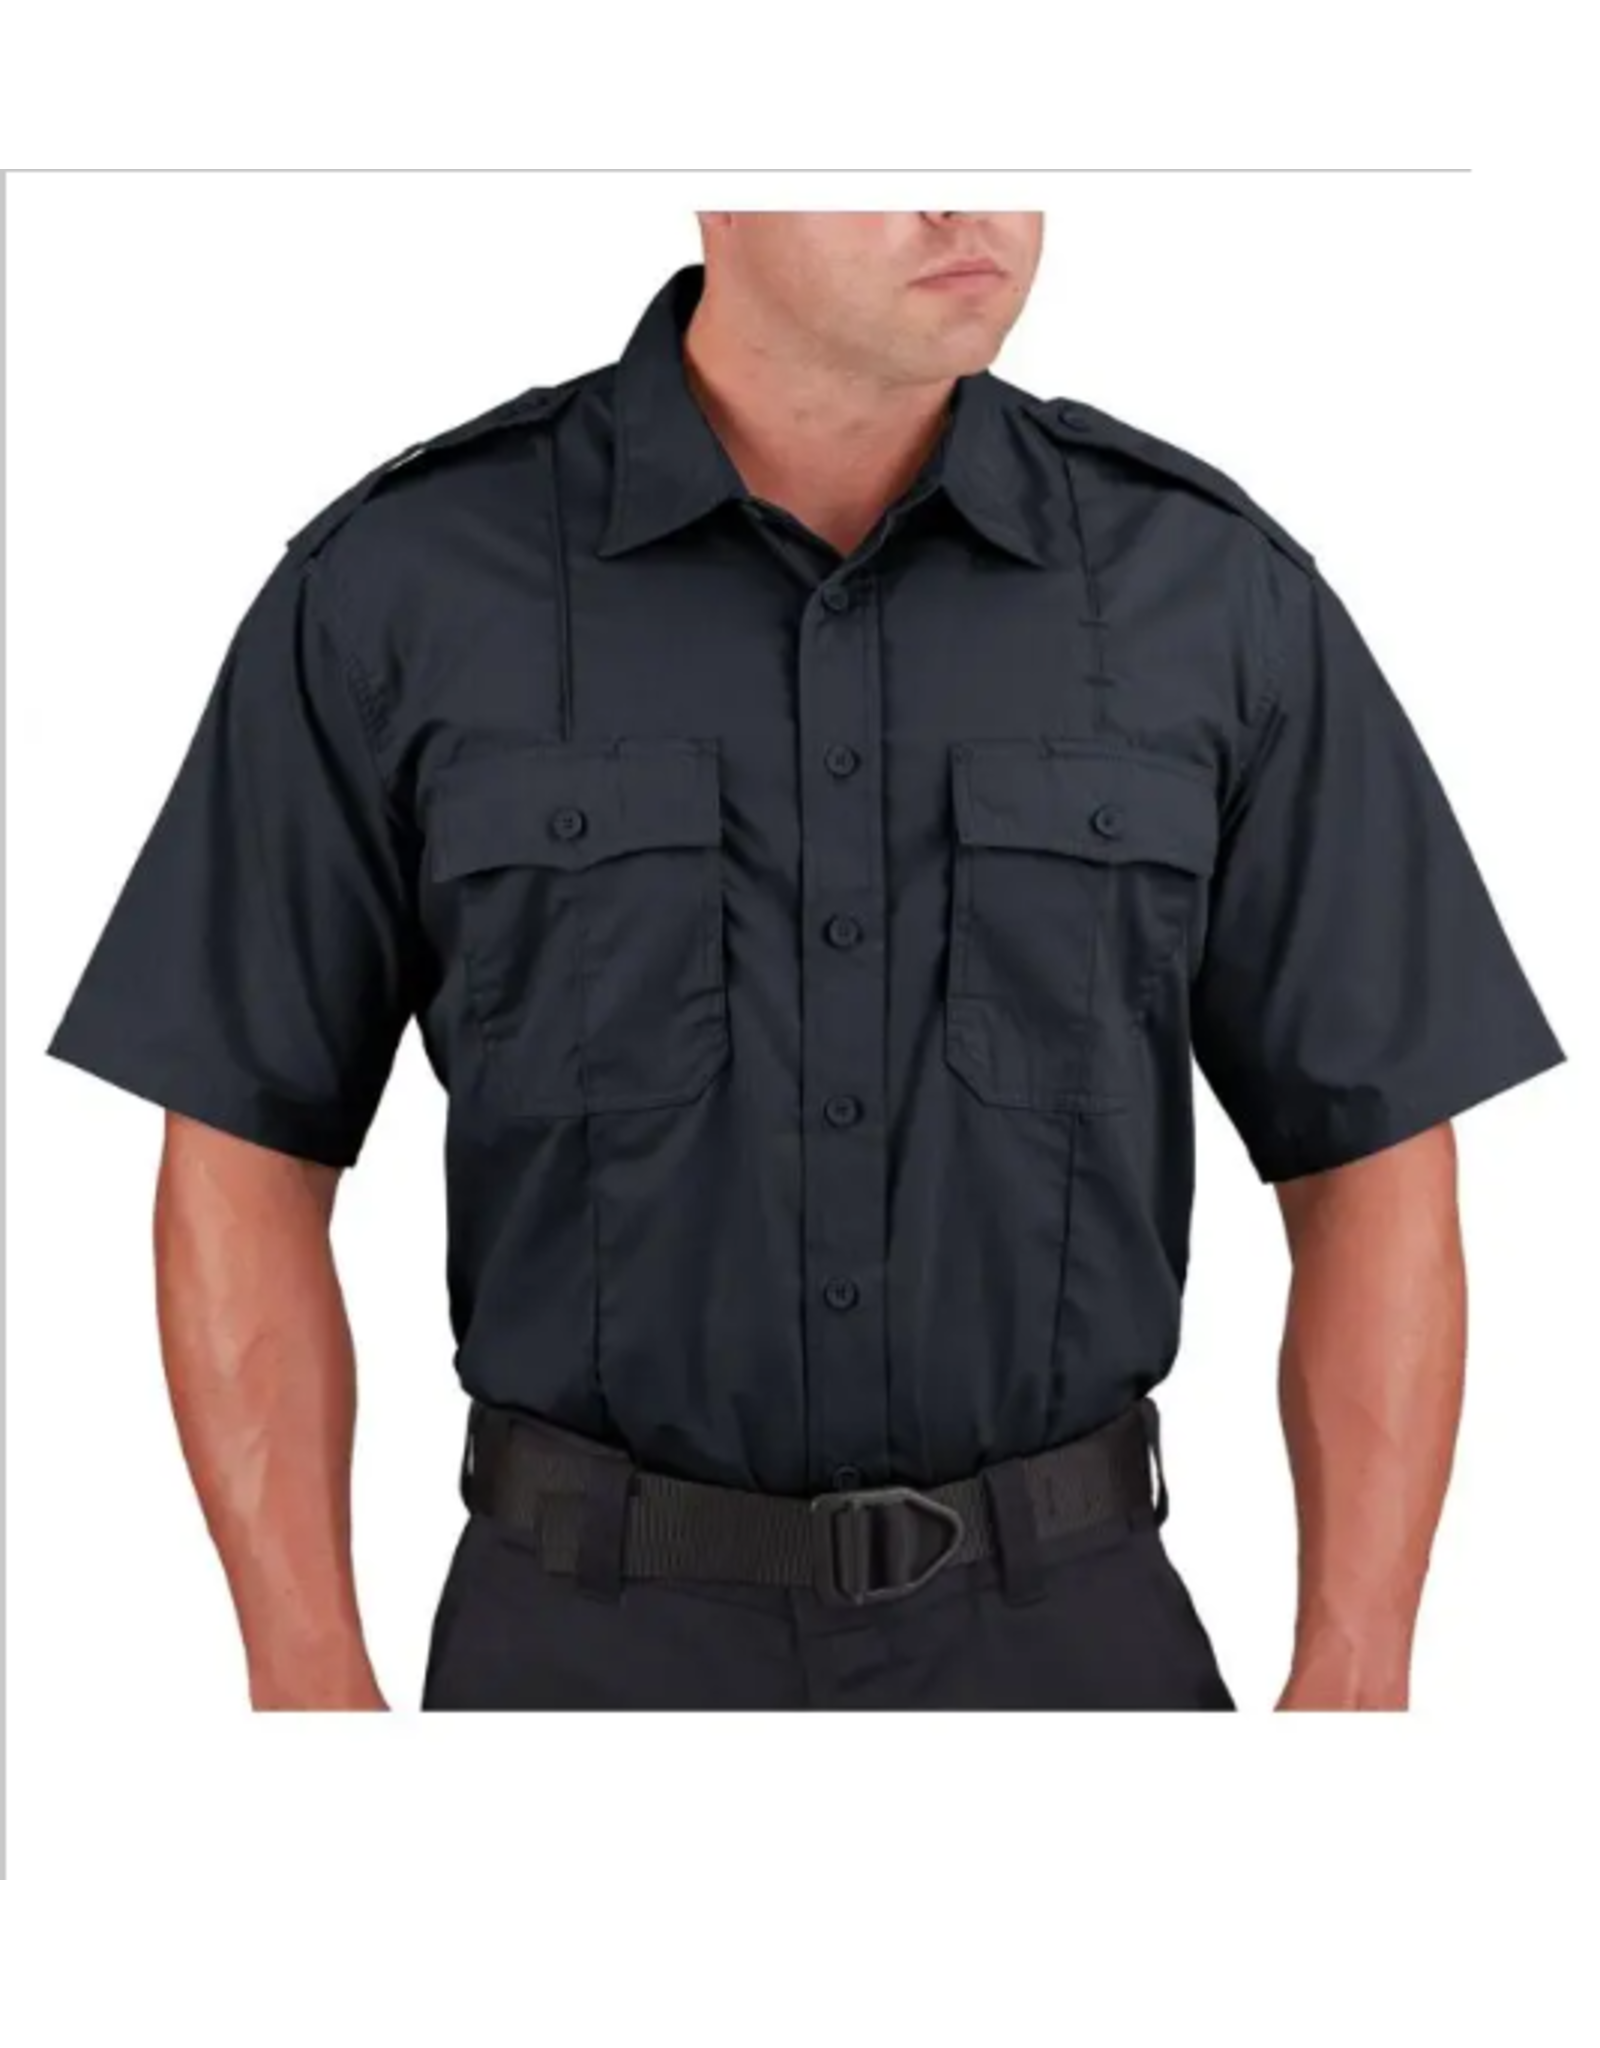 Propper Men's Duty Shirt Midnight Navy 2XL